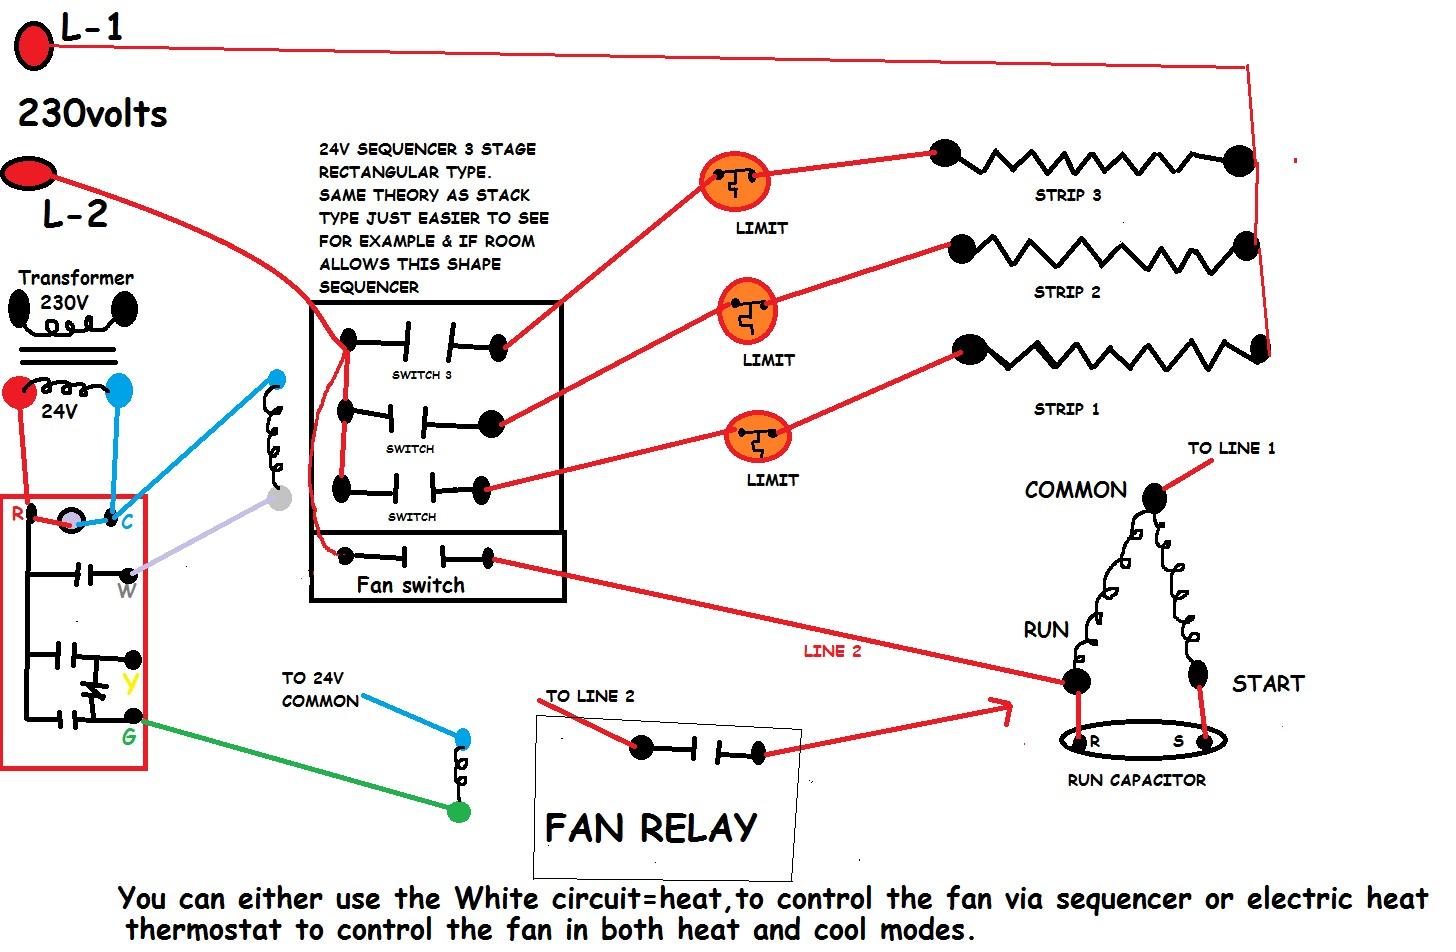 hight resolution of furnace fan relay wiring diagram collection fan relay wiring diagram fresh diagram furnace heat